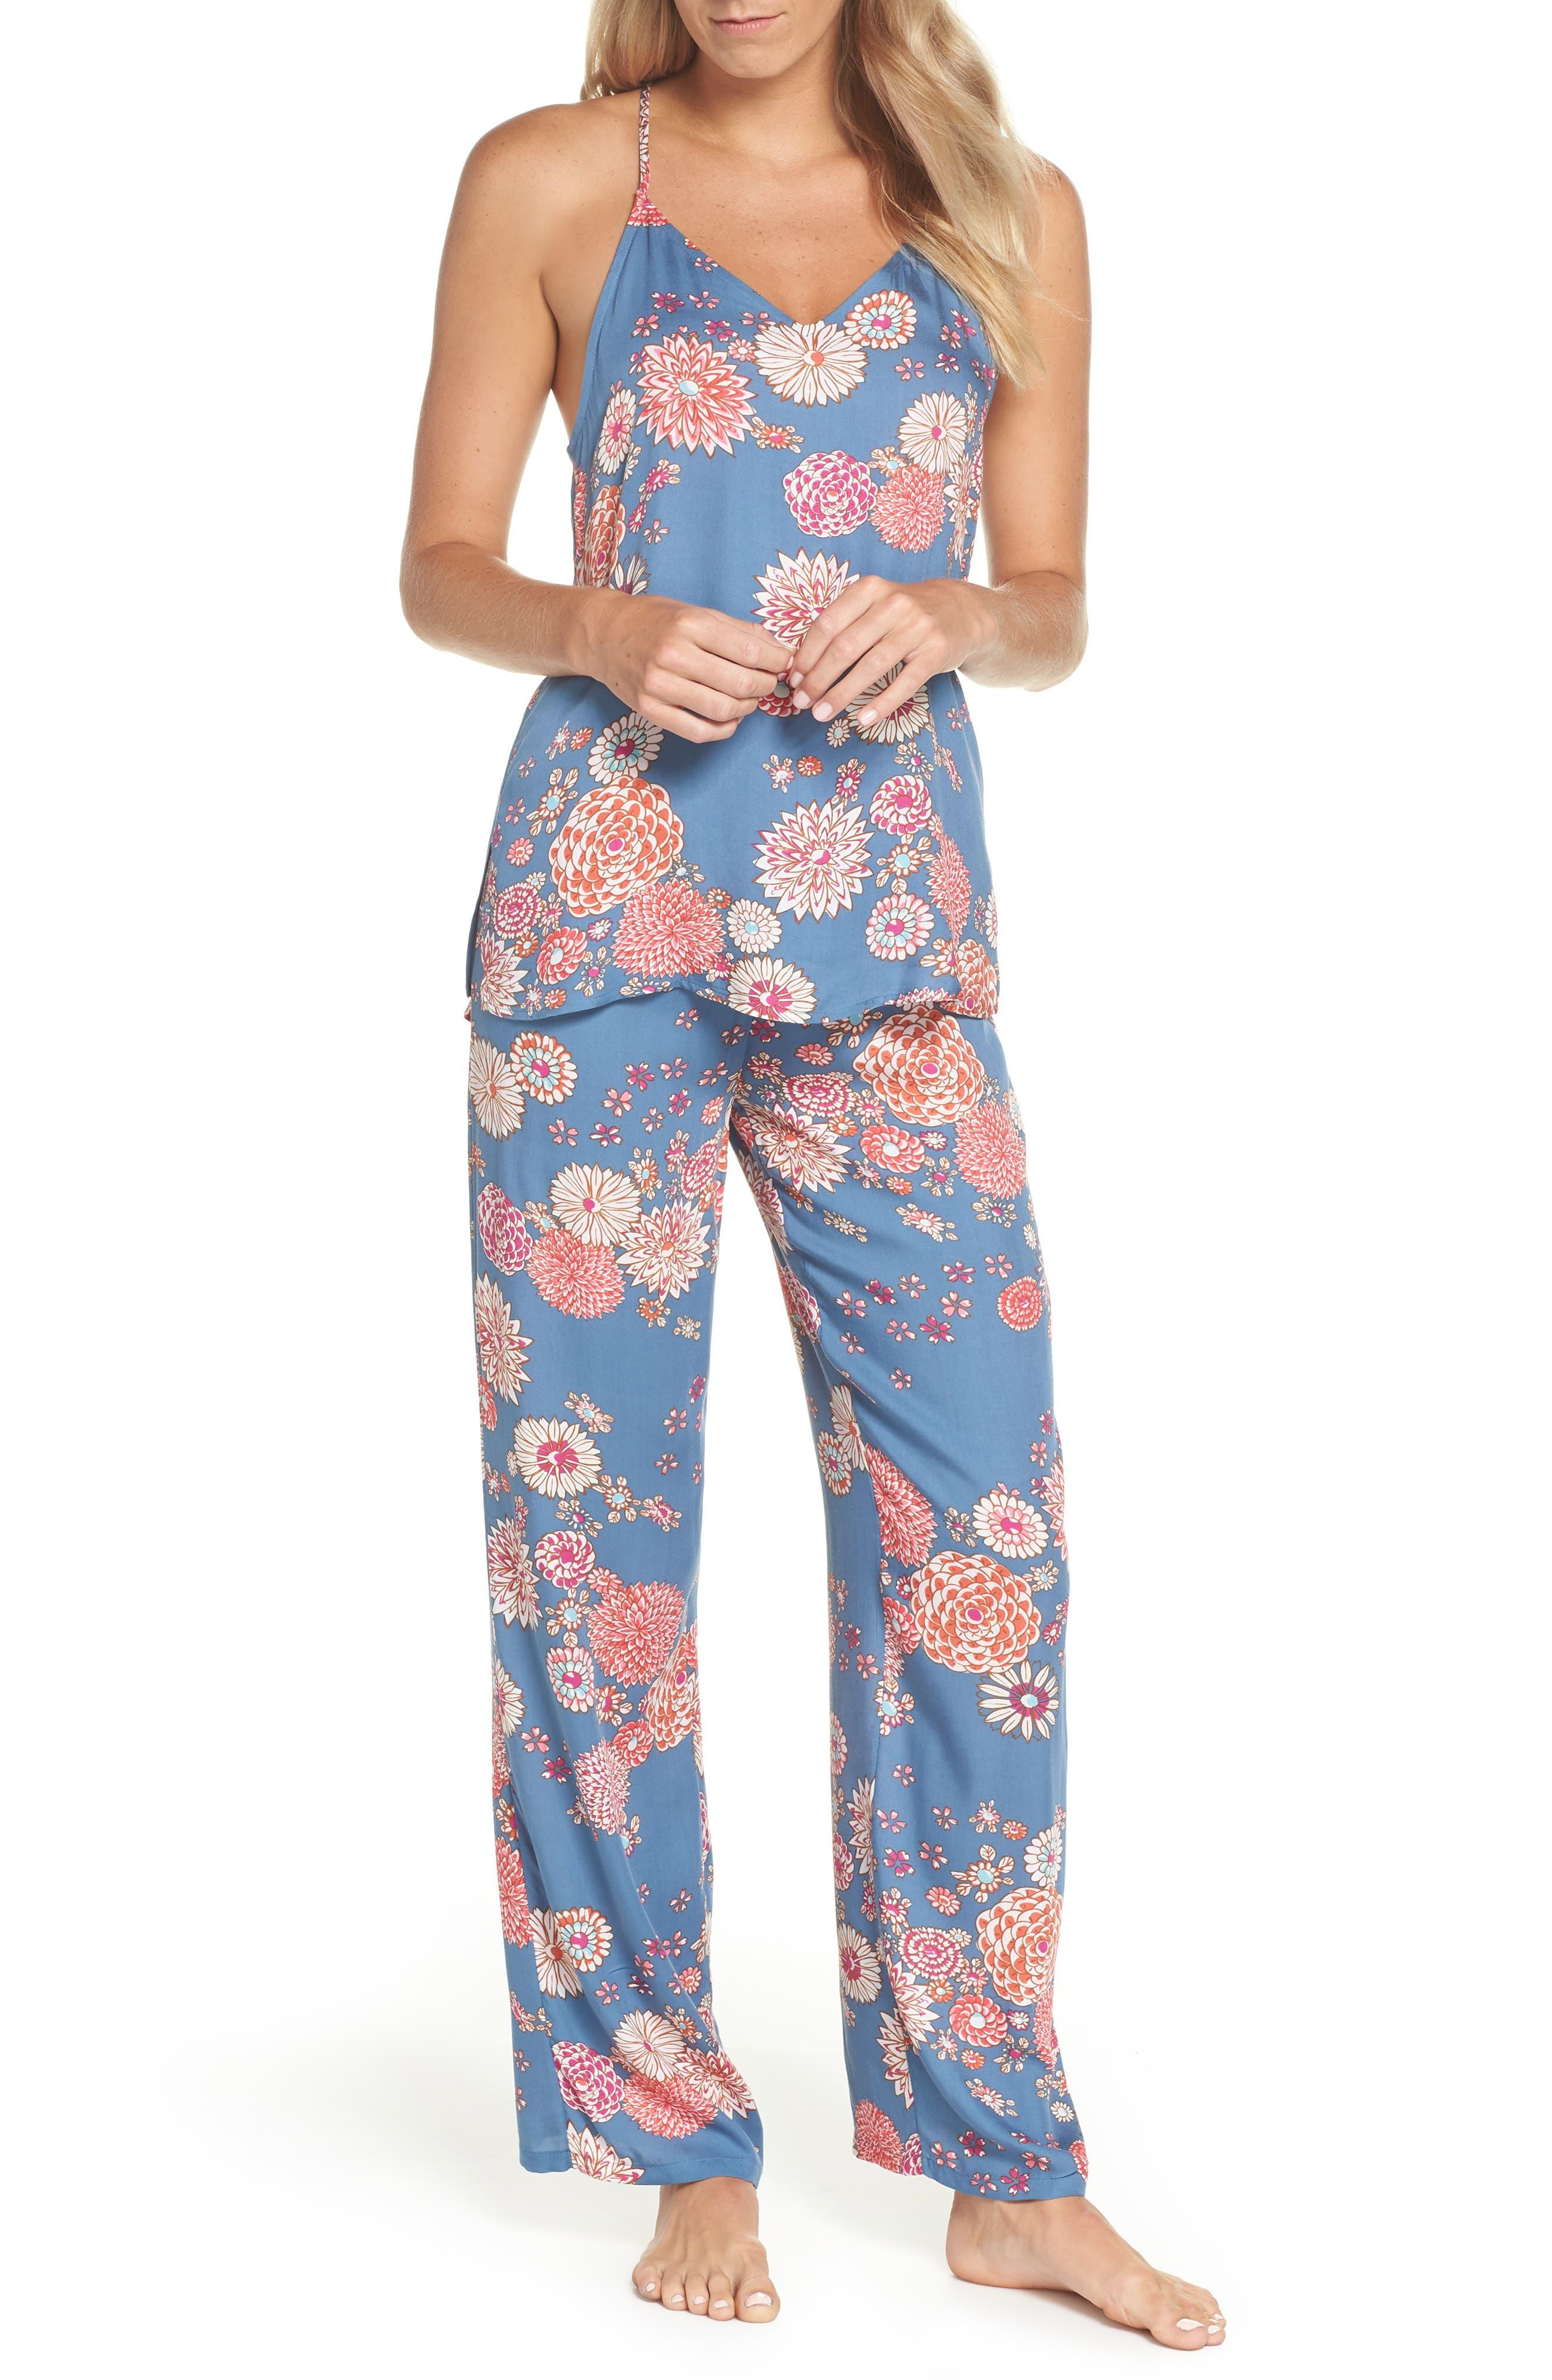 Floral Pajamas,                         Main,                         color, Steallar Blue